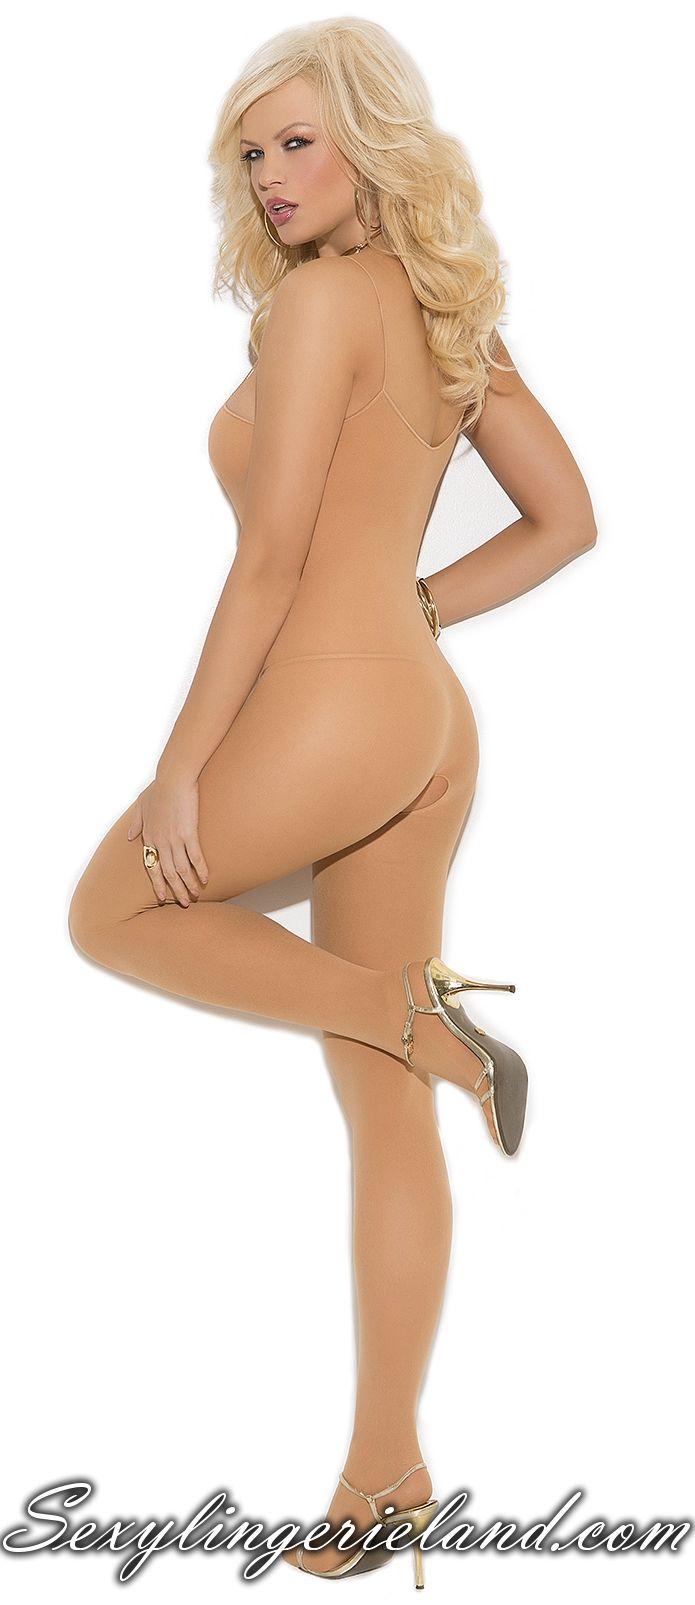 em-1601 nude nylon bodystocking | babes | pinterest | body stocking